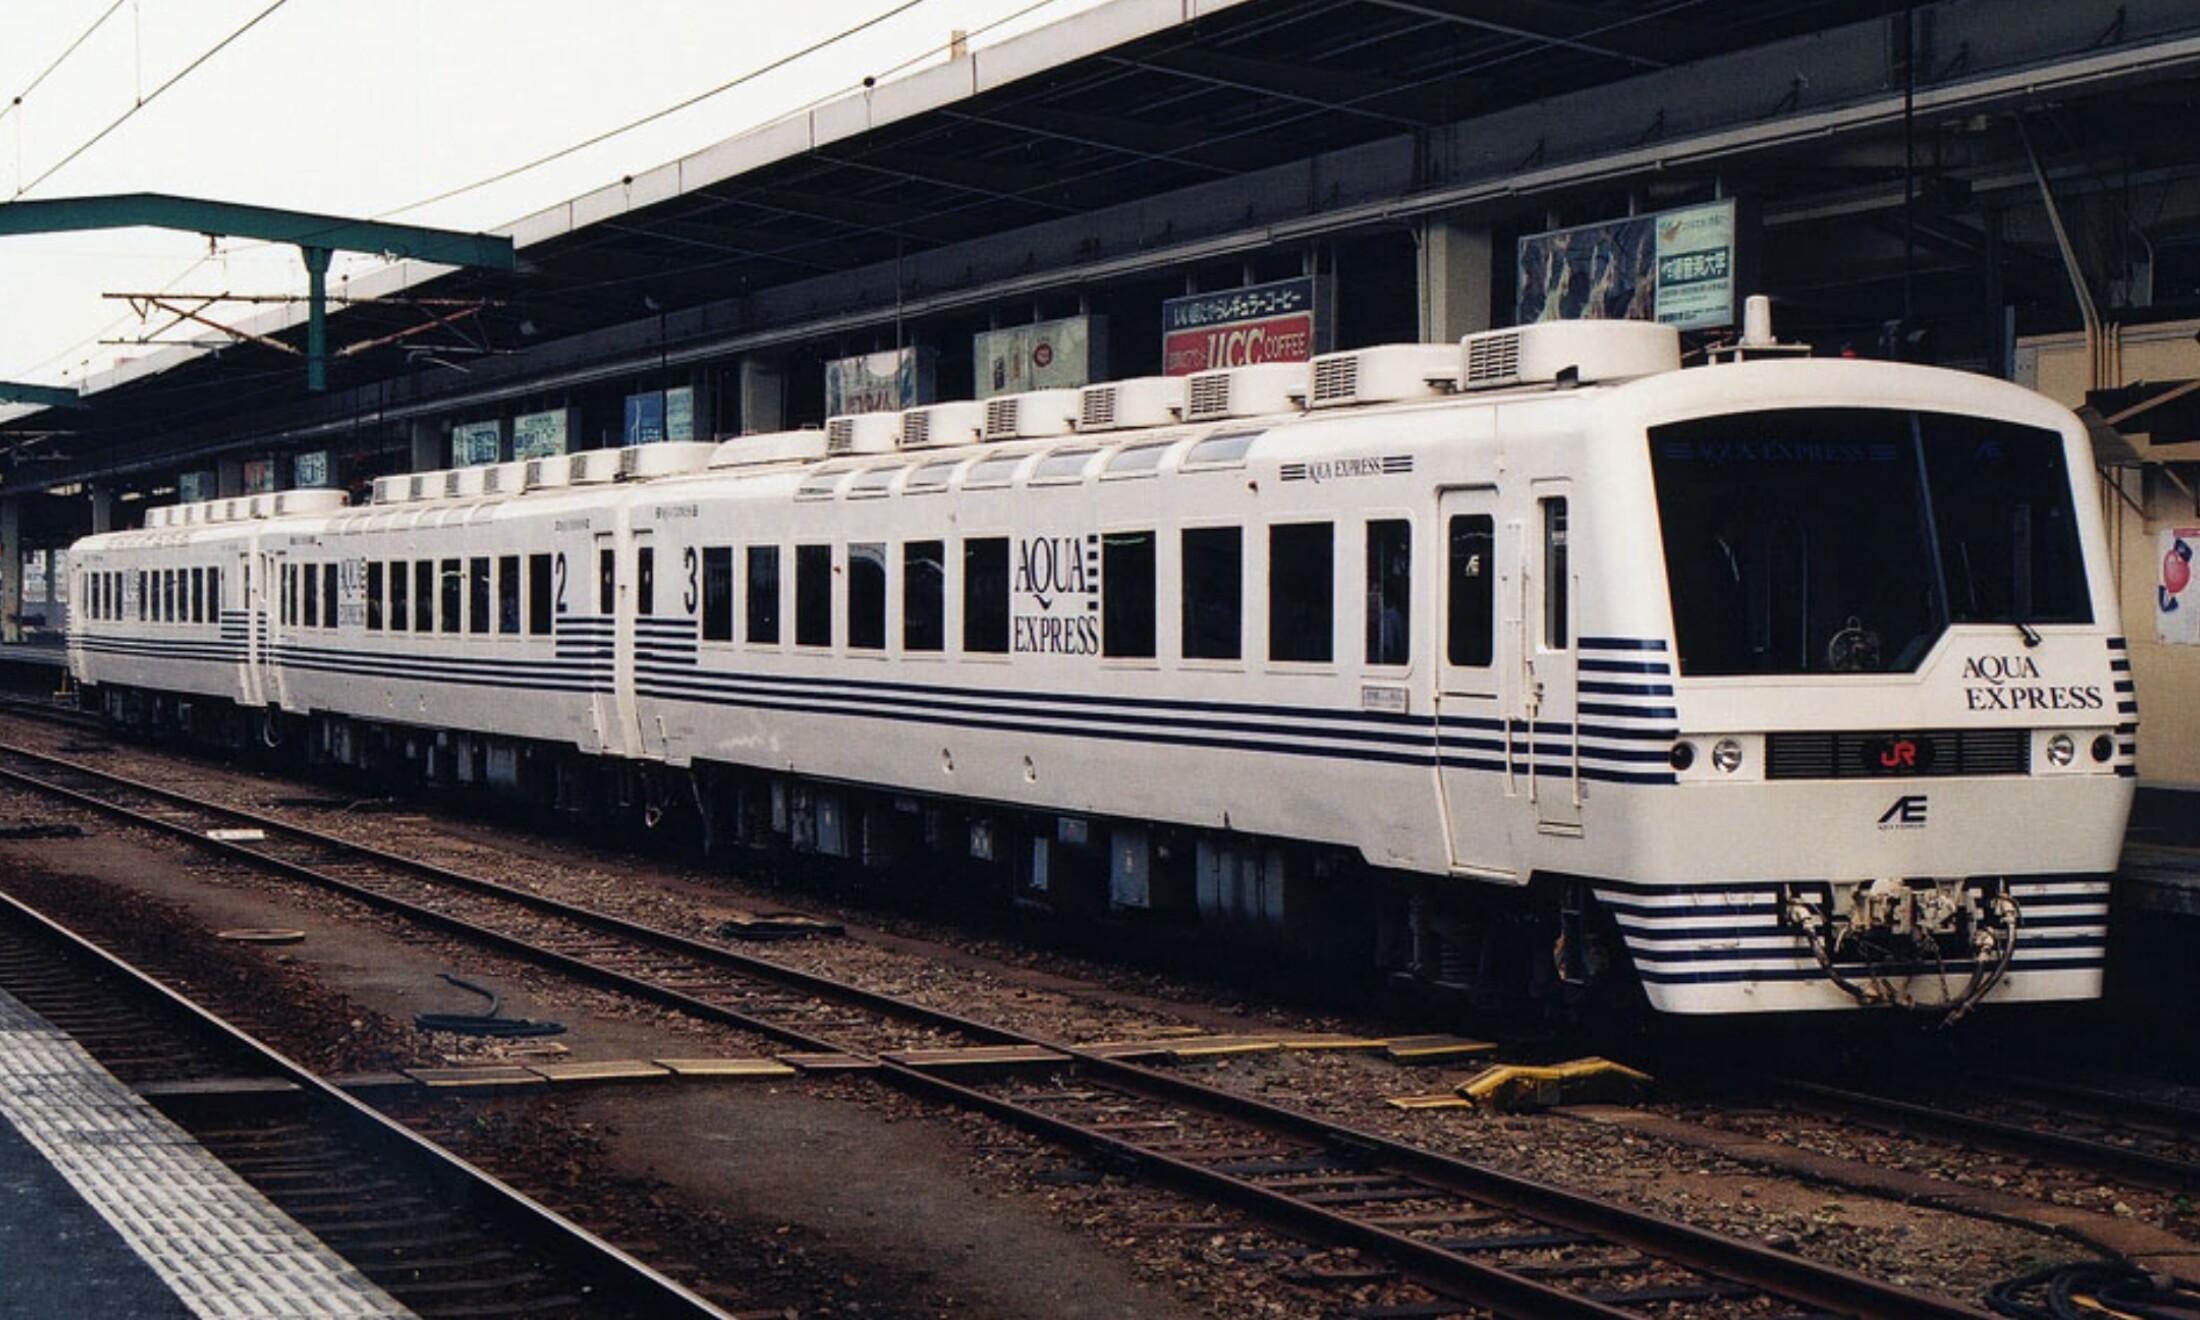 JR-Kyushui_KIHA-58_Series_Aqua_Express